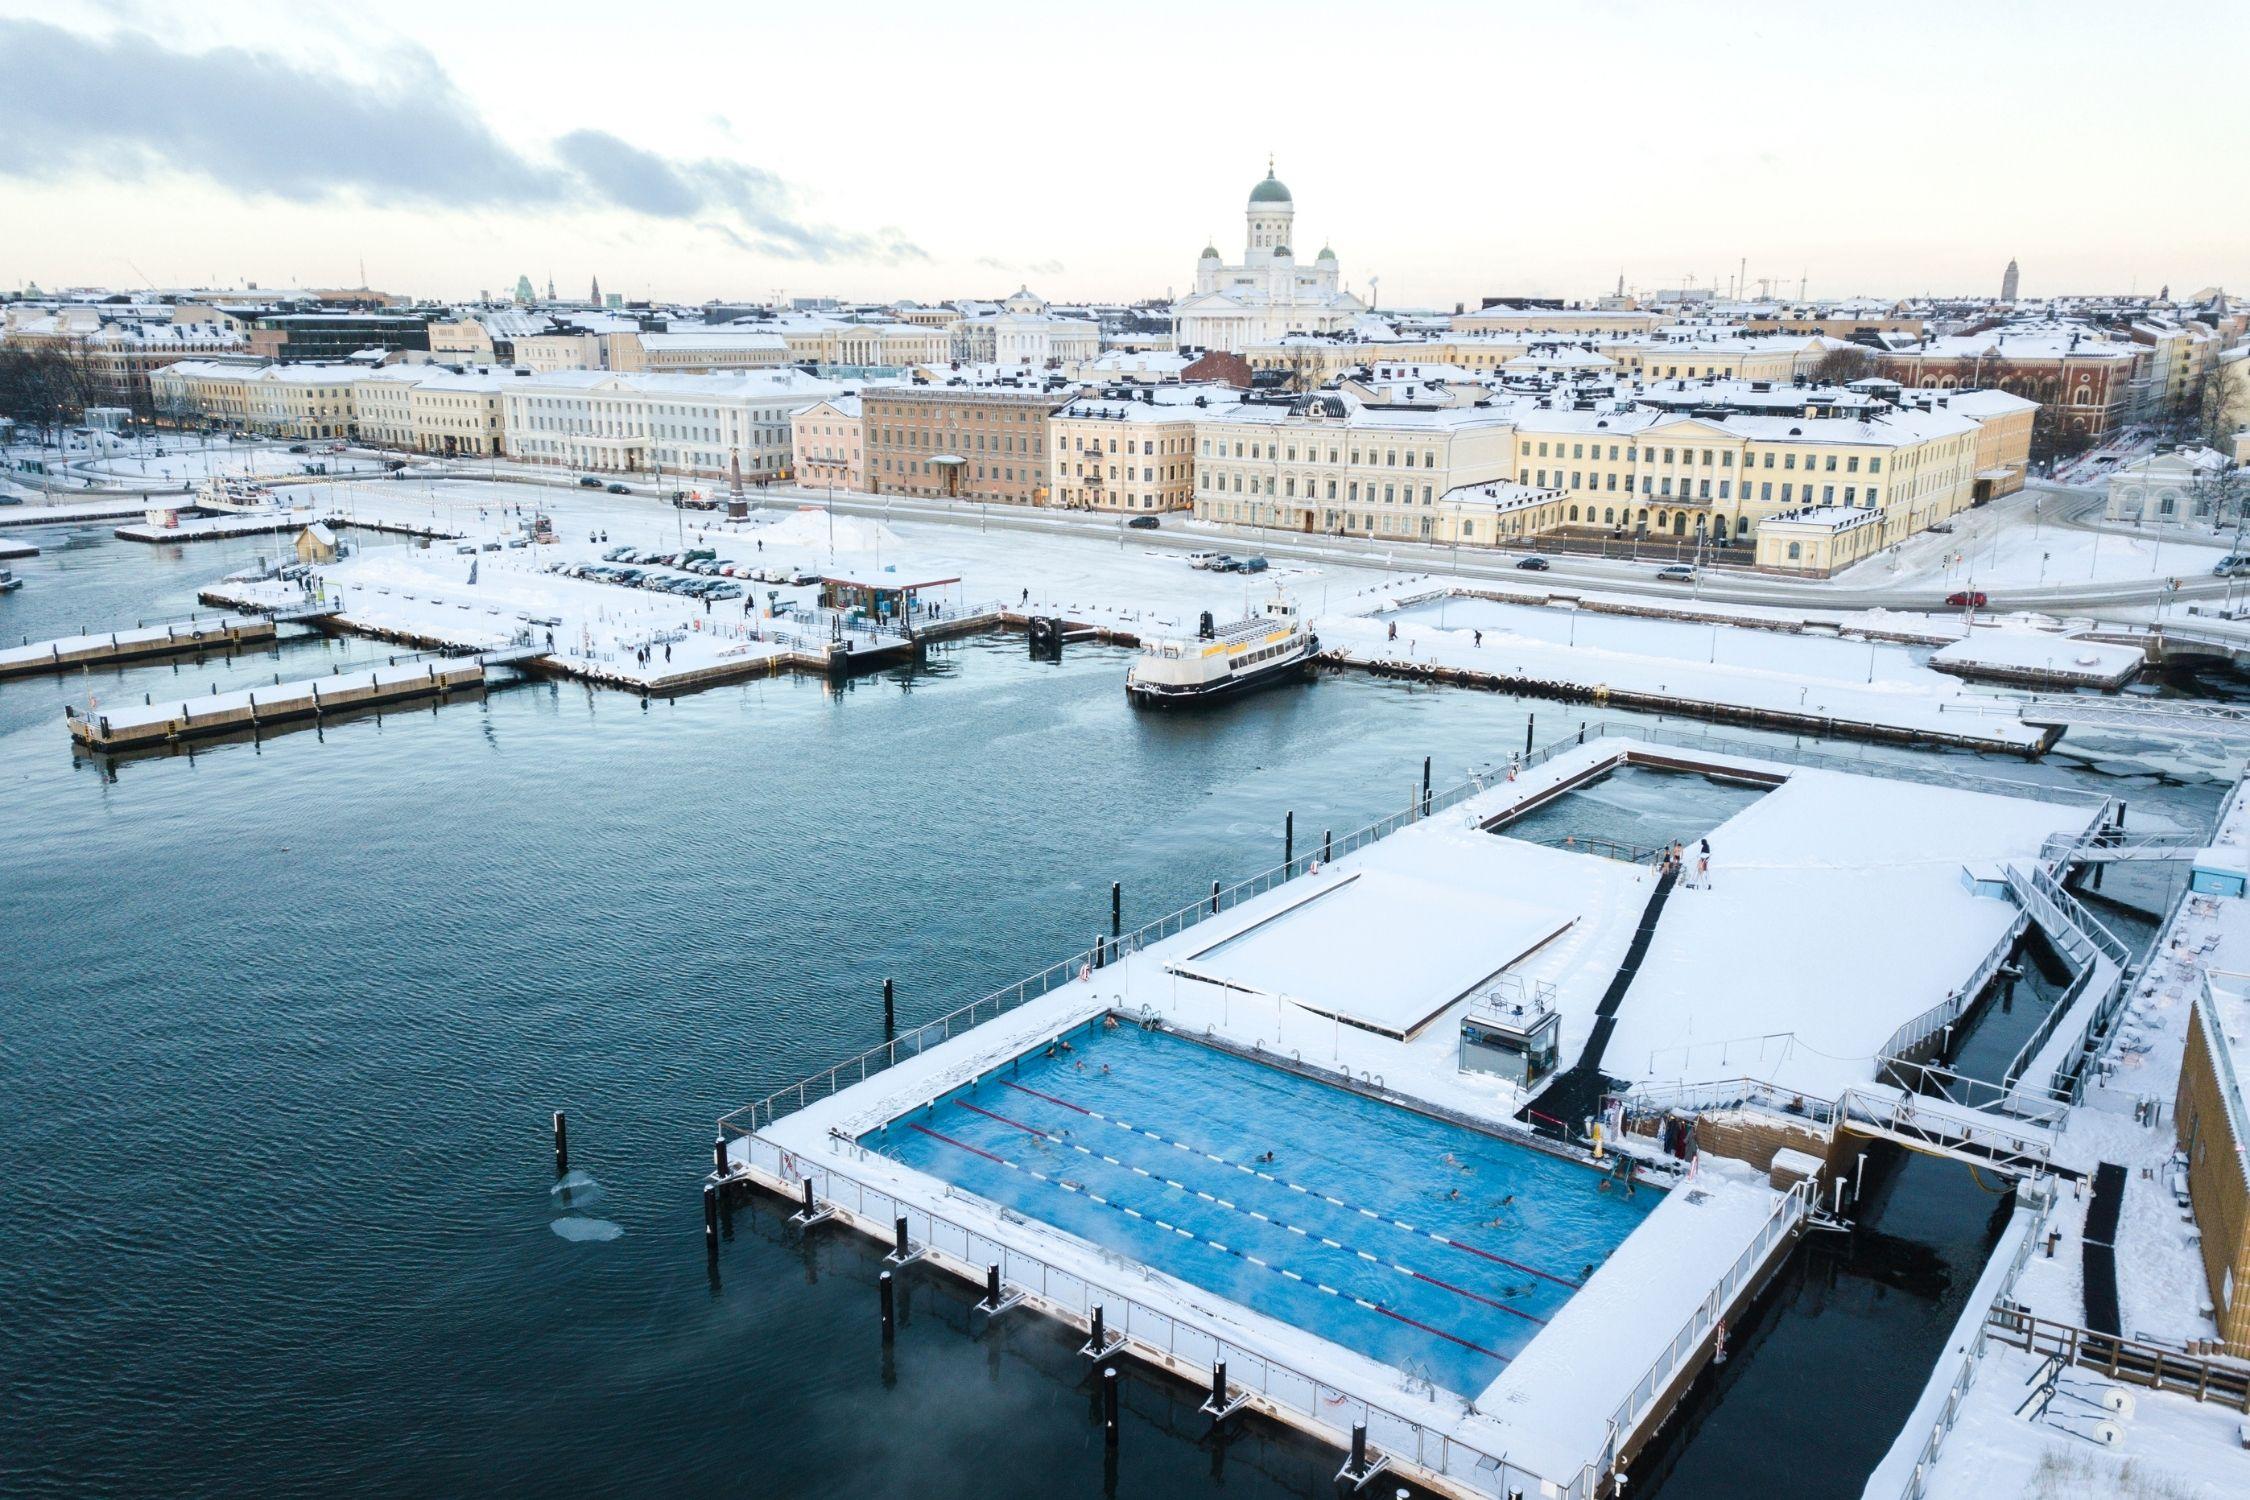 The Allas Sea Pool on the Helsinki Harbour